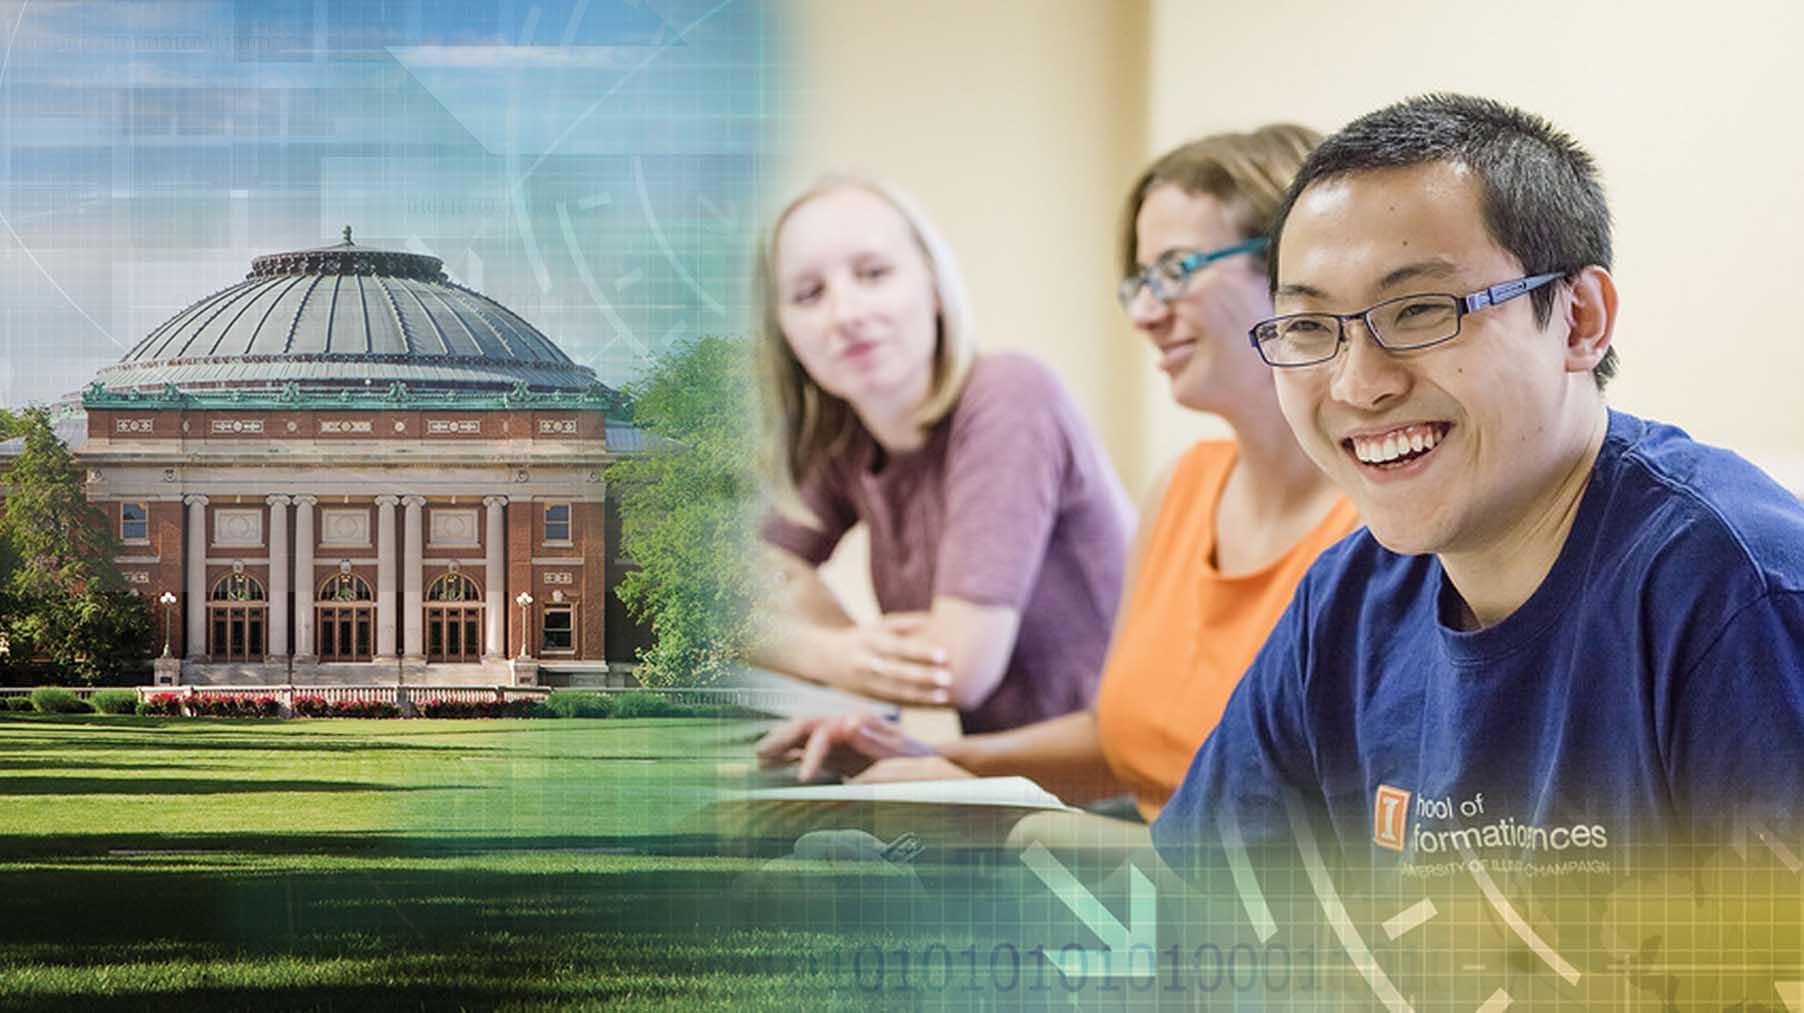 Master of Science in Information Management online degree program